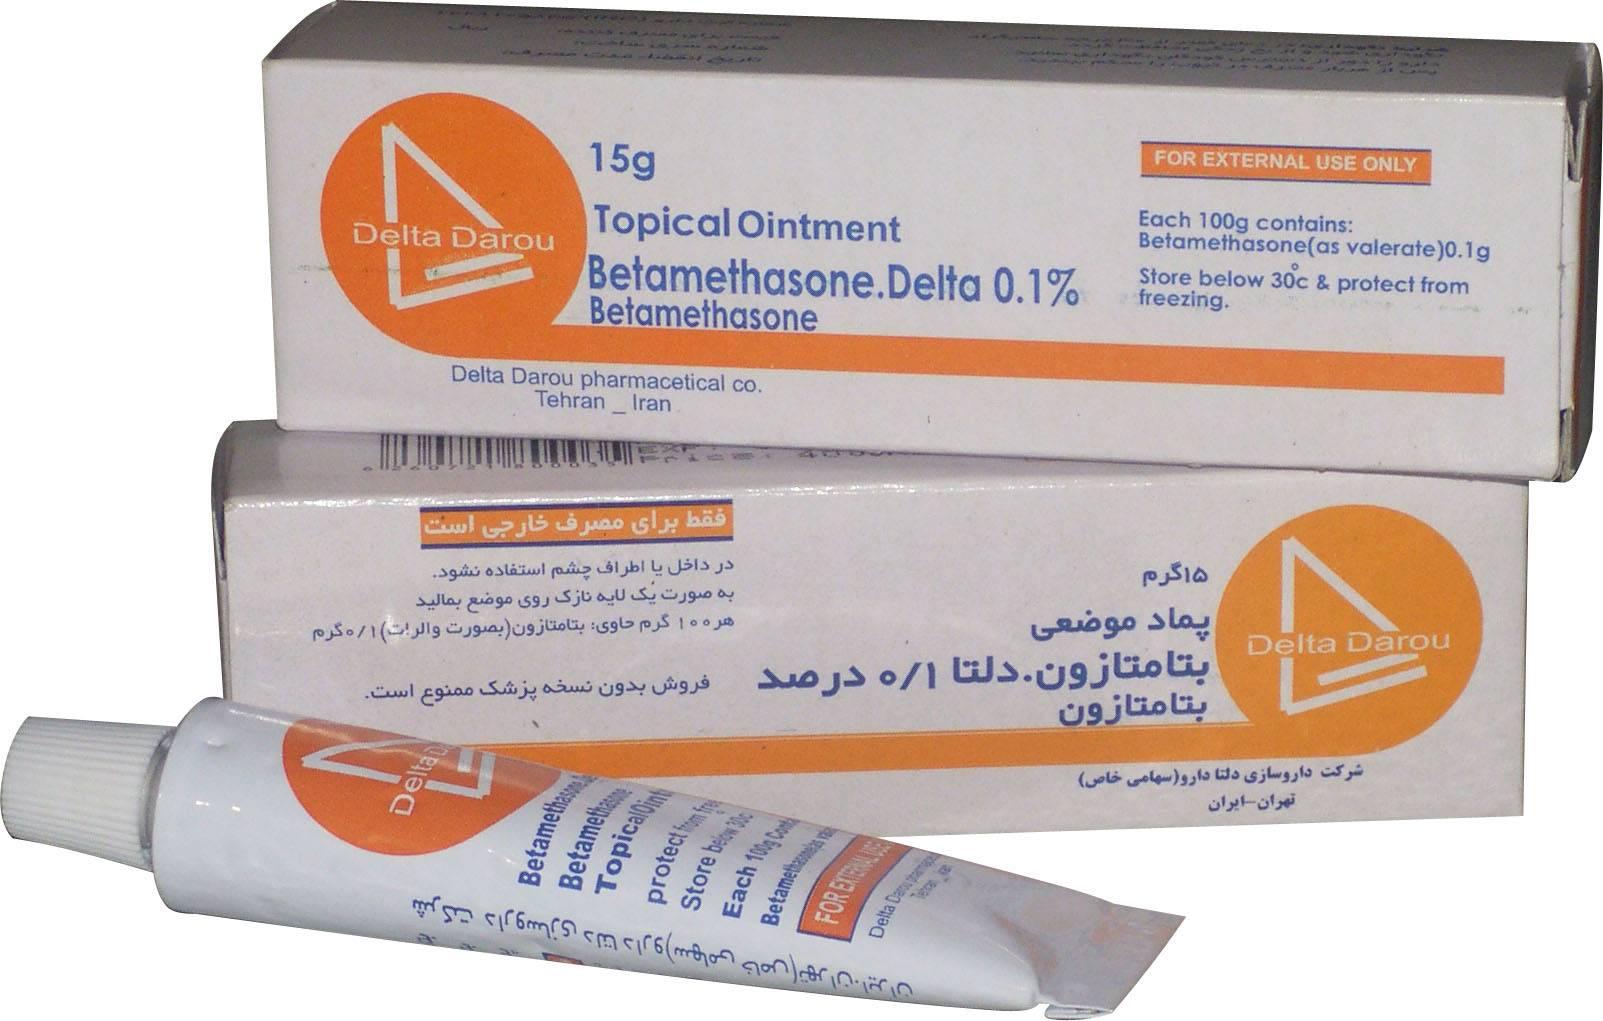 Betamethasone ointment - deltadarou